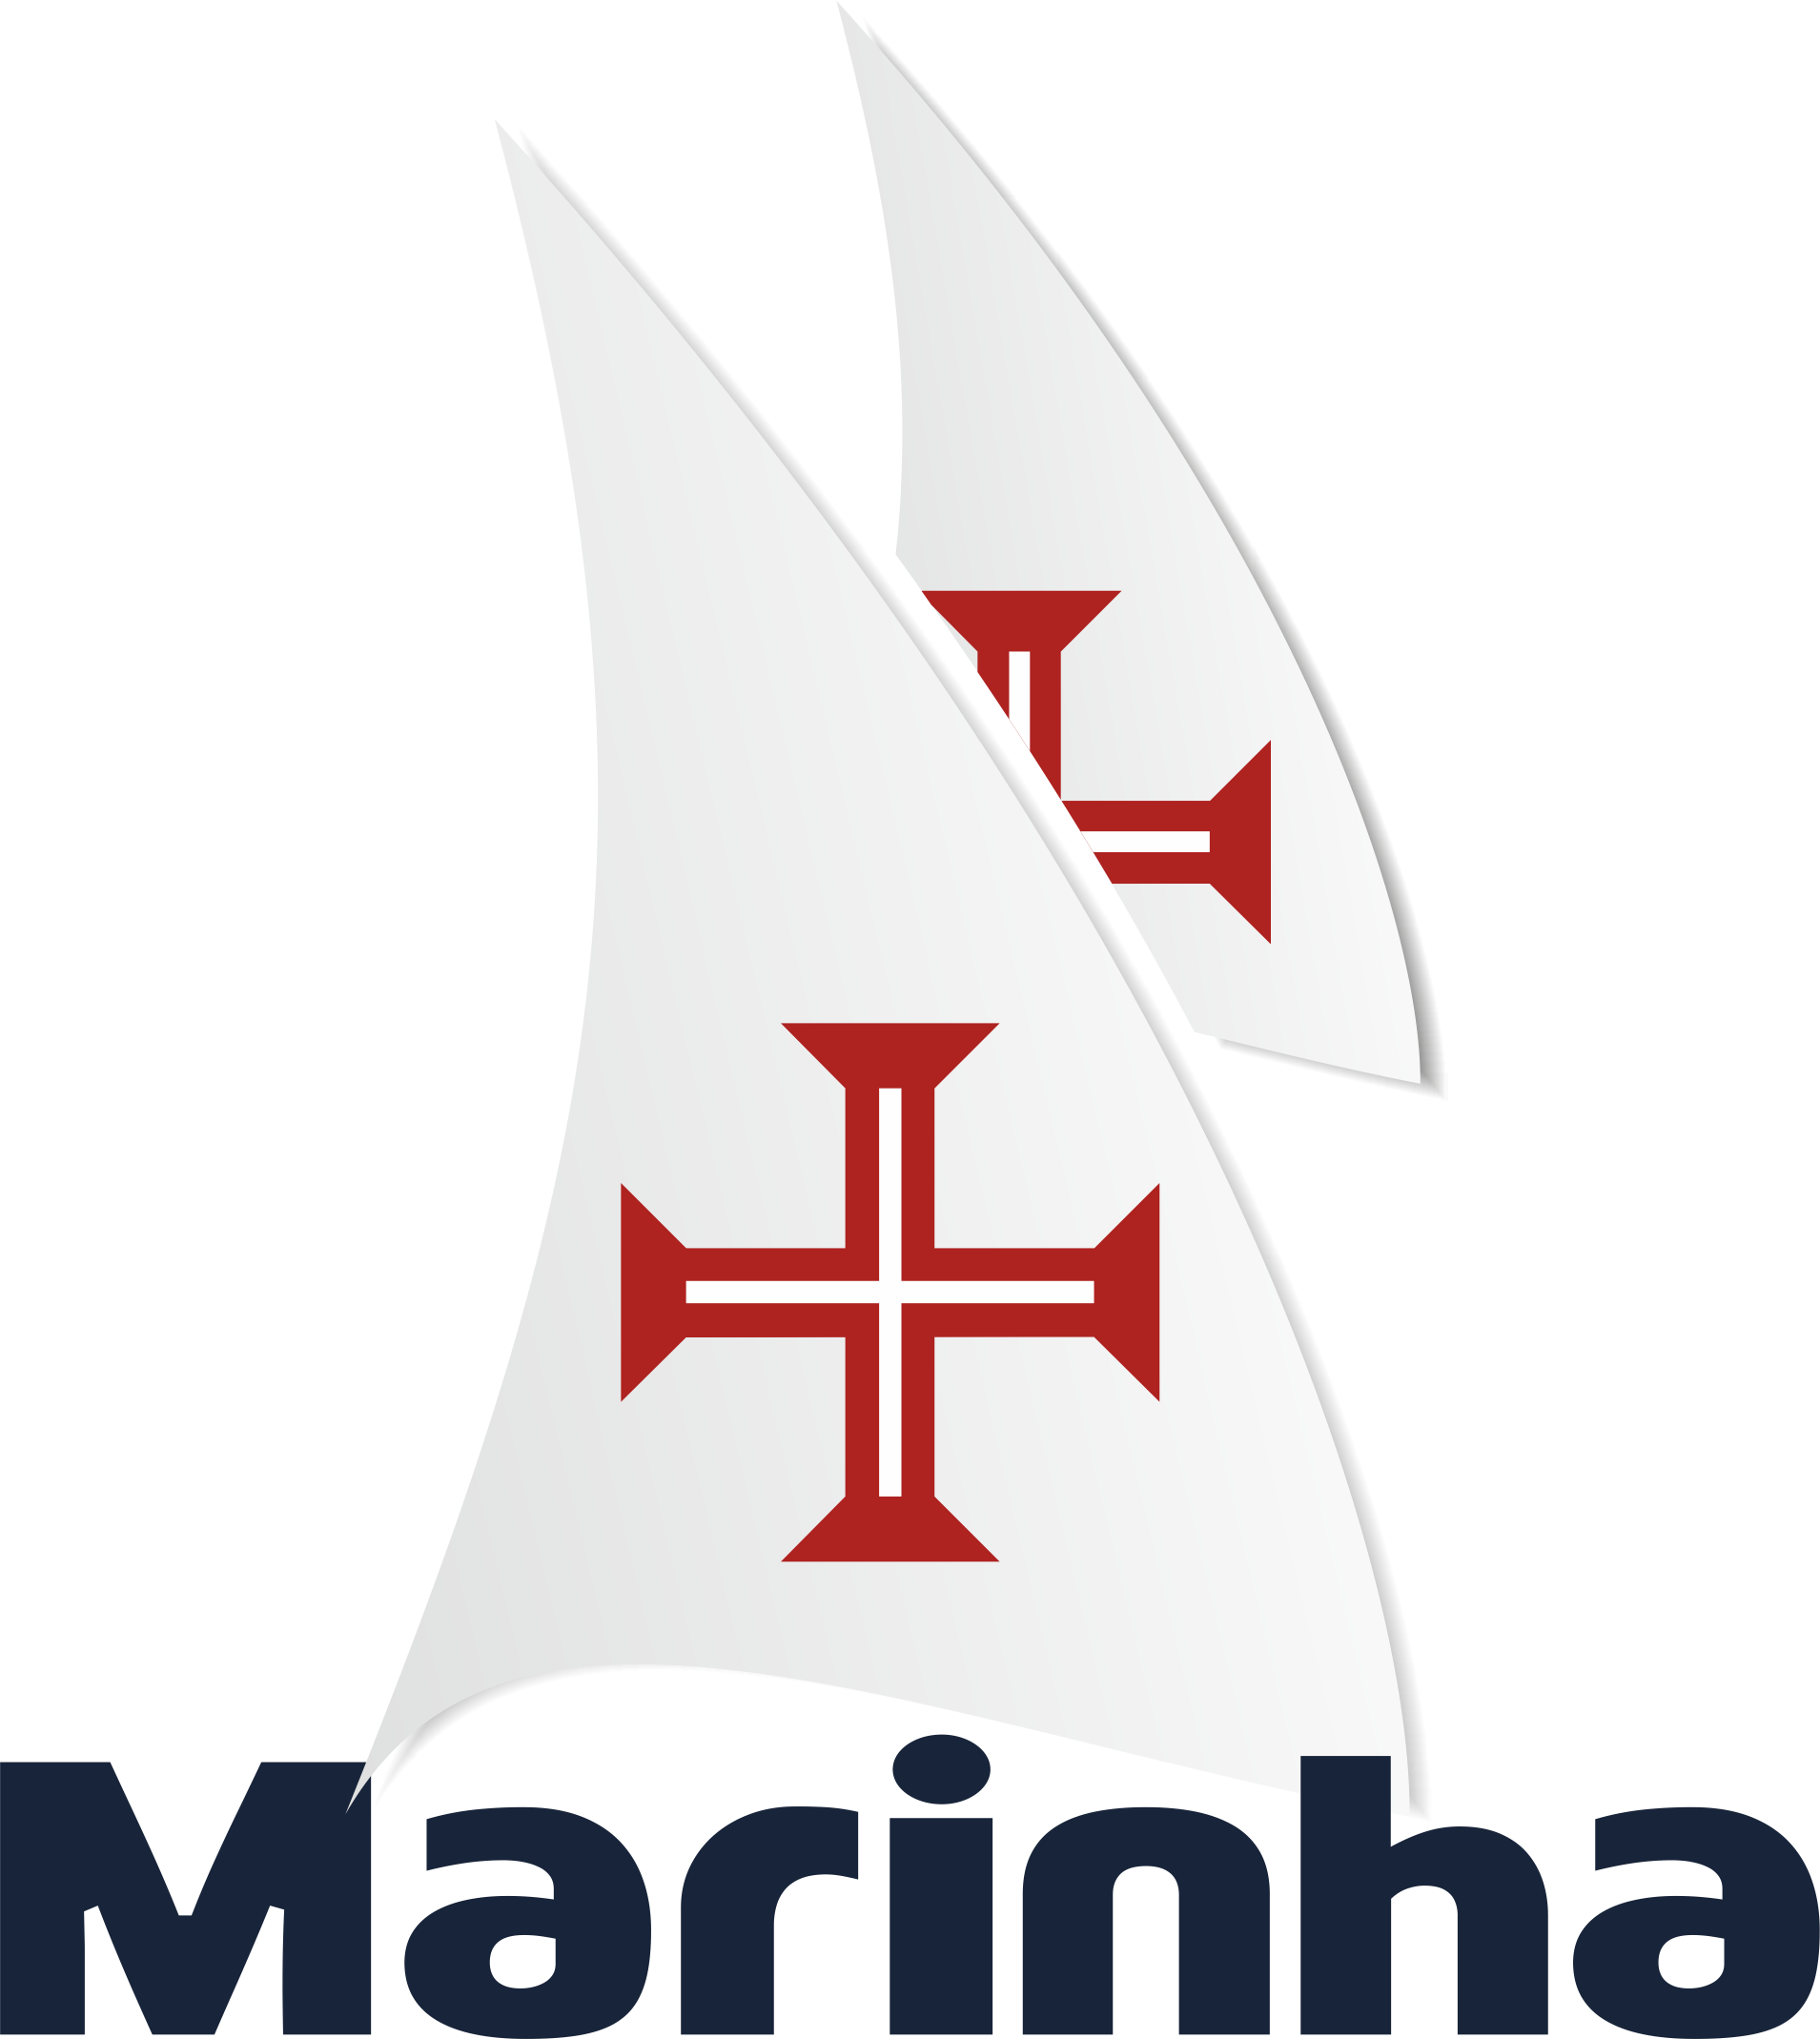 Portuguese Navy